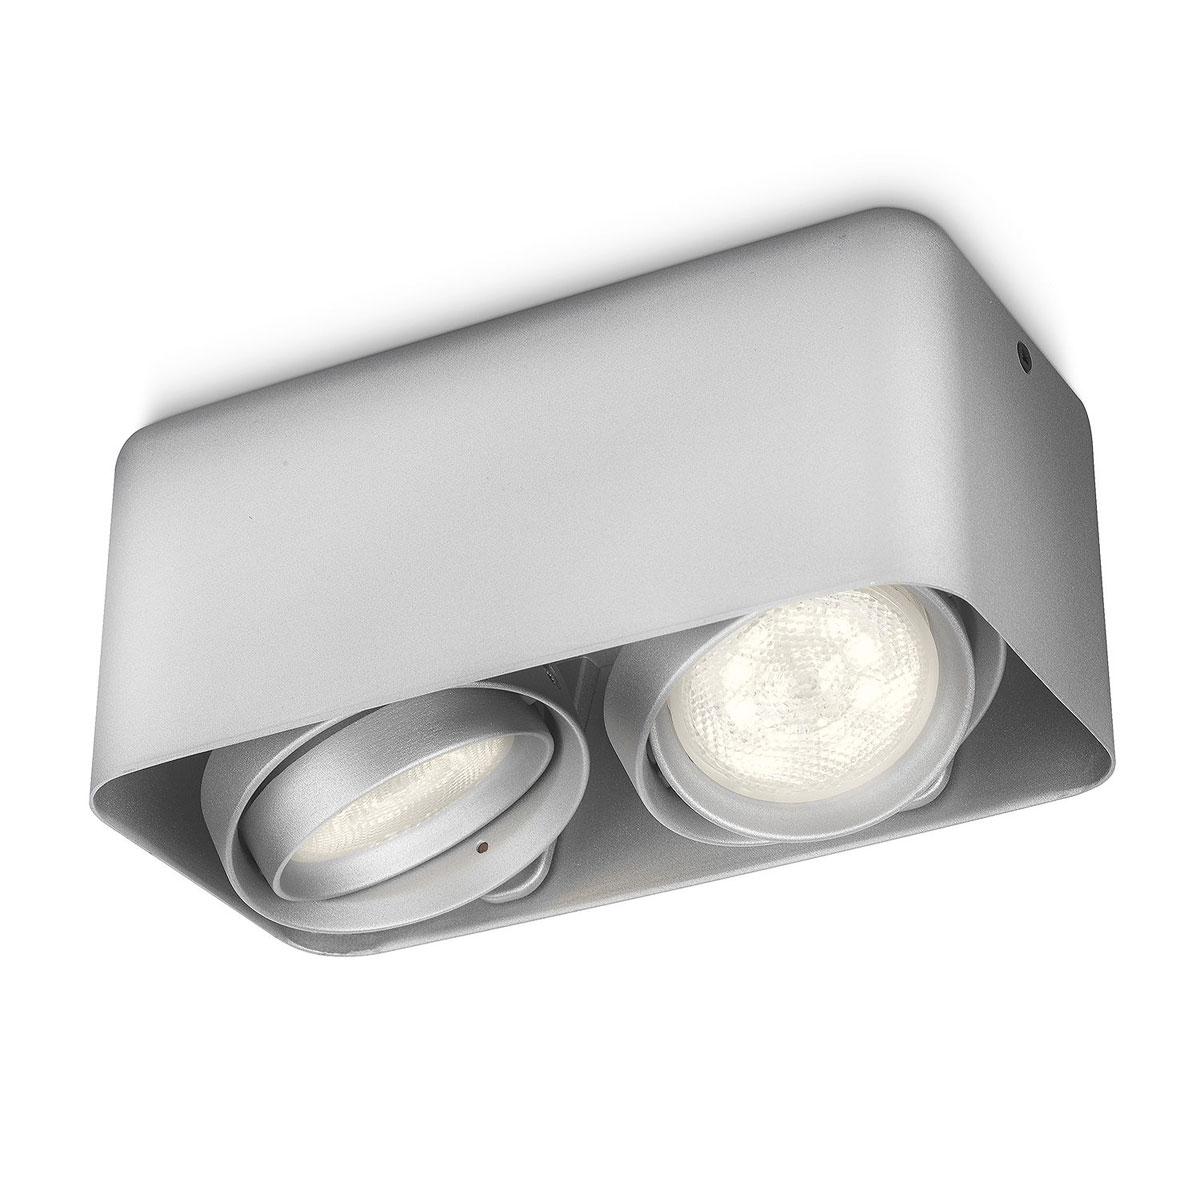 philips myliving afzelia spot aluminium 2 spots. Black Bedroom Furniture Sets. Home Design Ideas